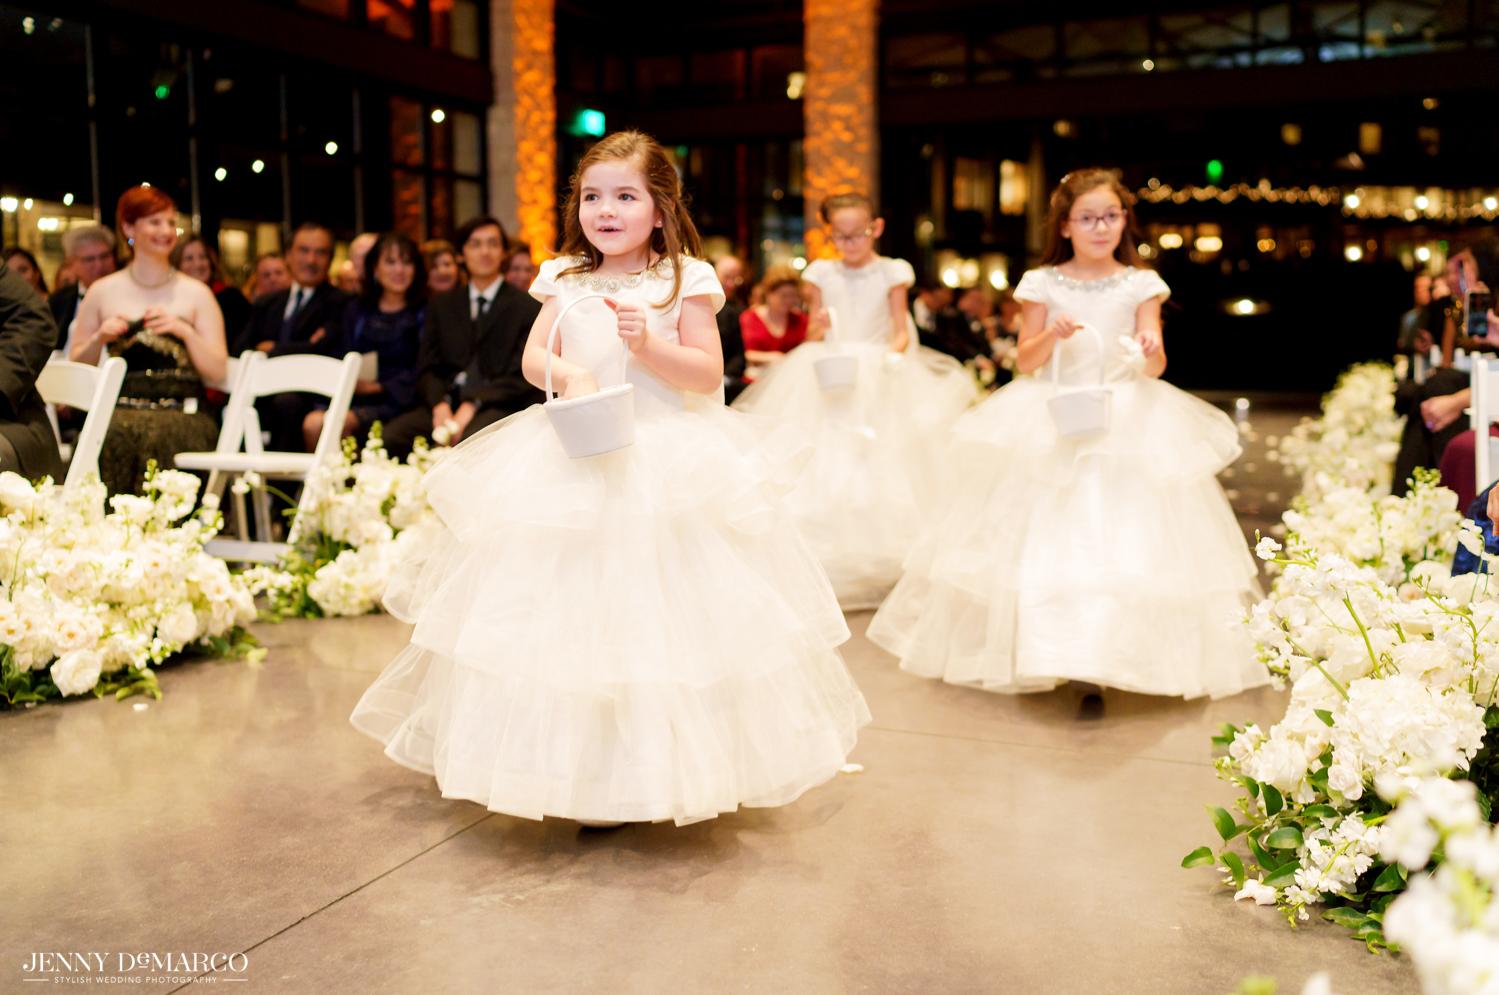 the flower girls walking down the aisle in white dresses